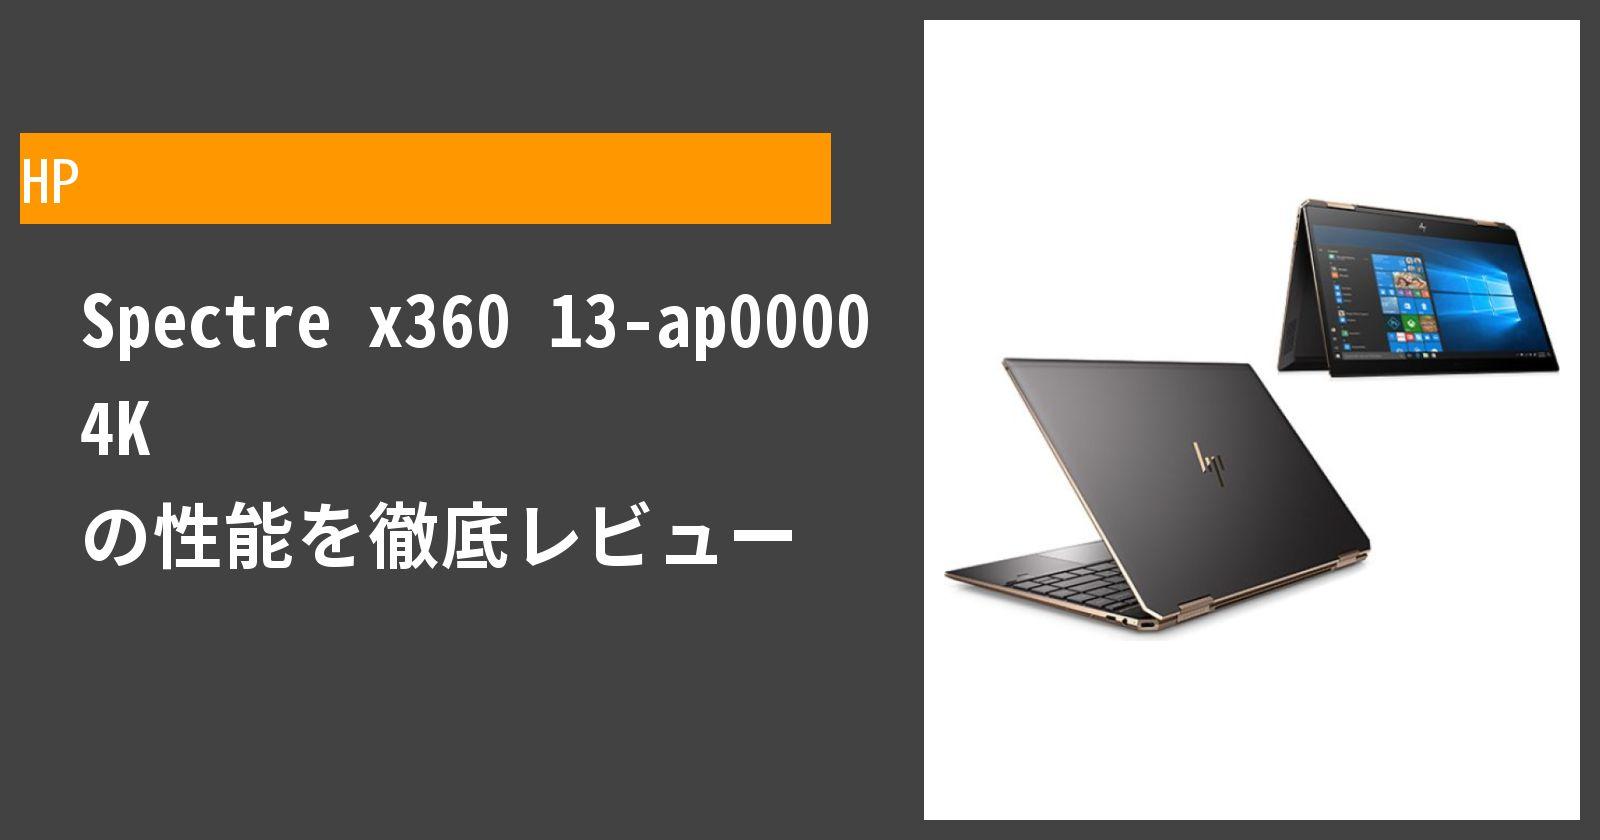 Spectre x360 13-ap0000 4K の性能を徹底レビュー